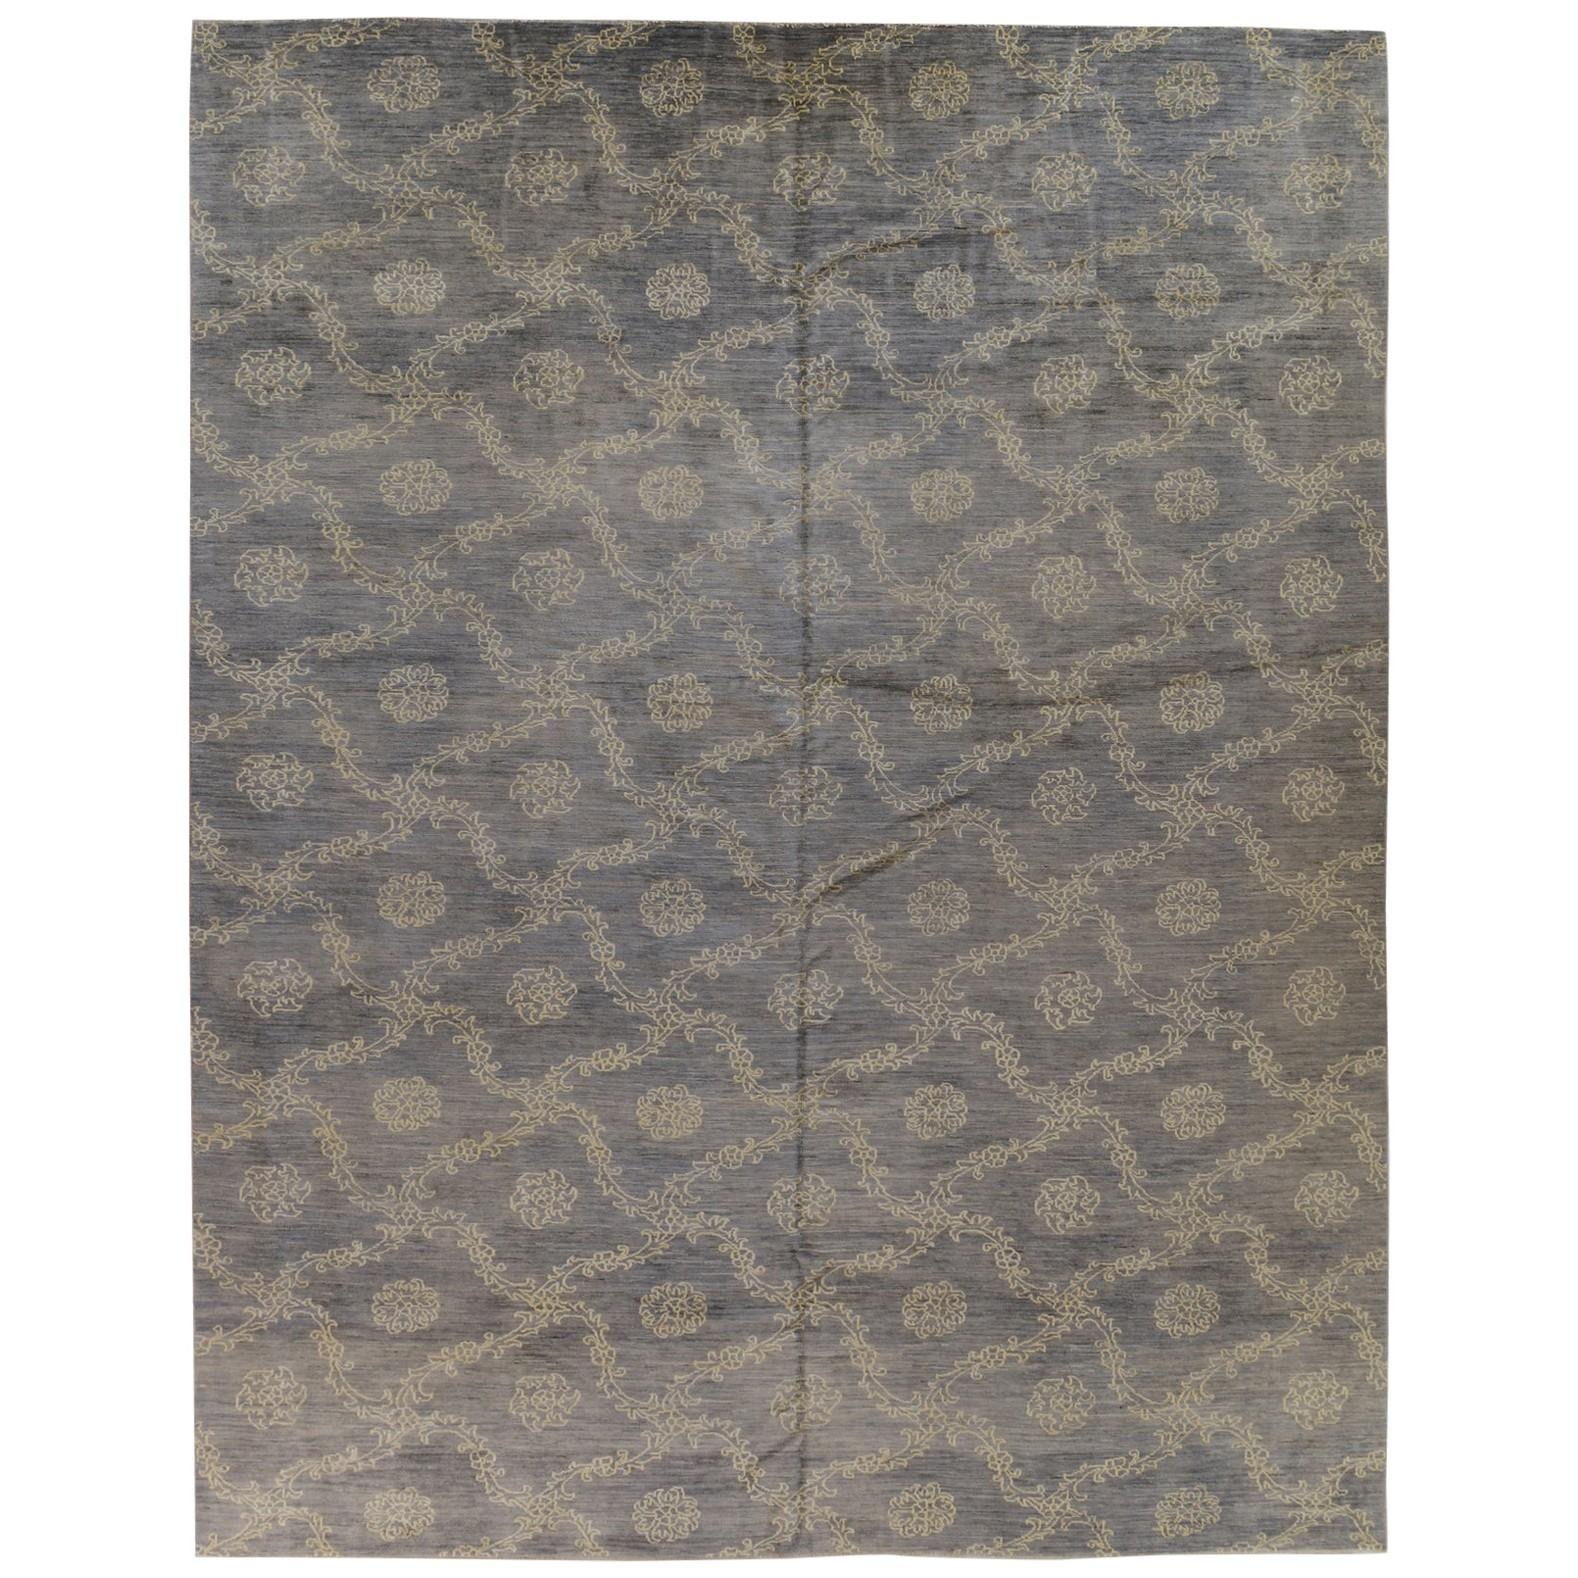 Silver Blue Floral Stencil Design Wool and Silk Rug